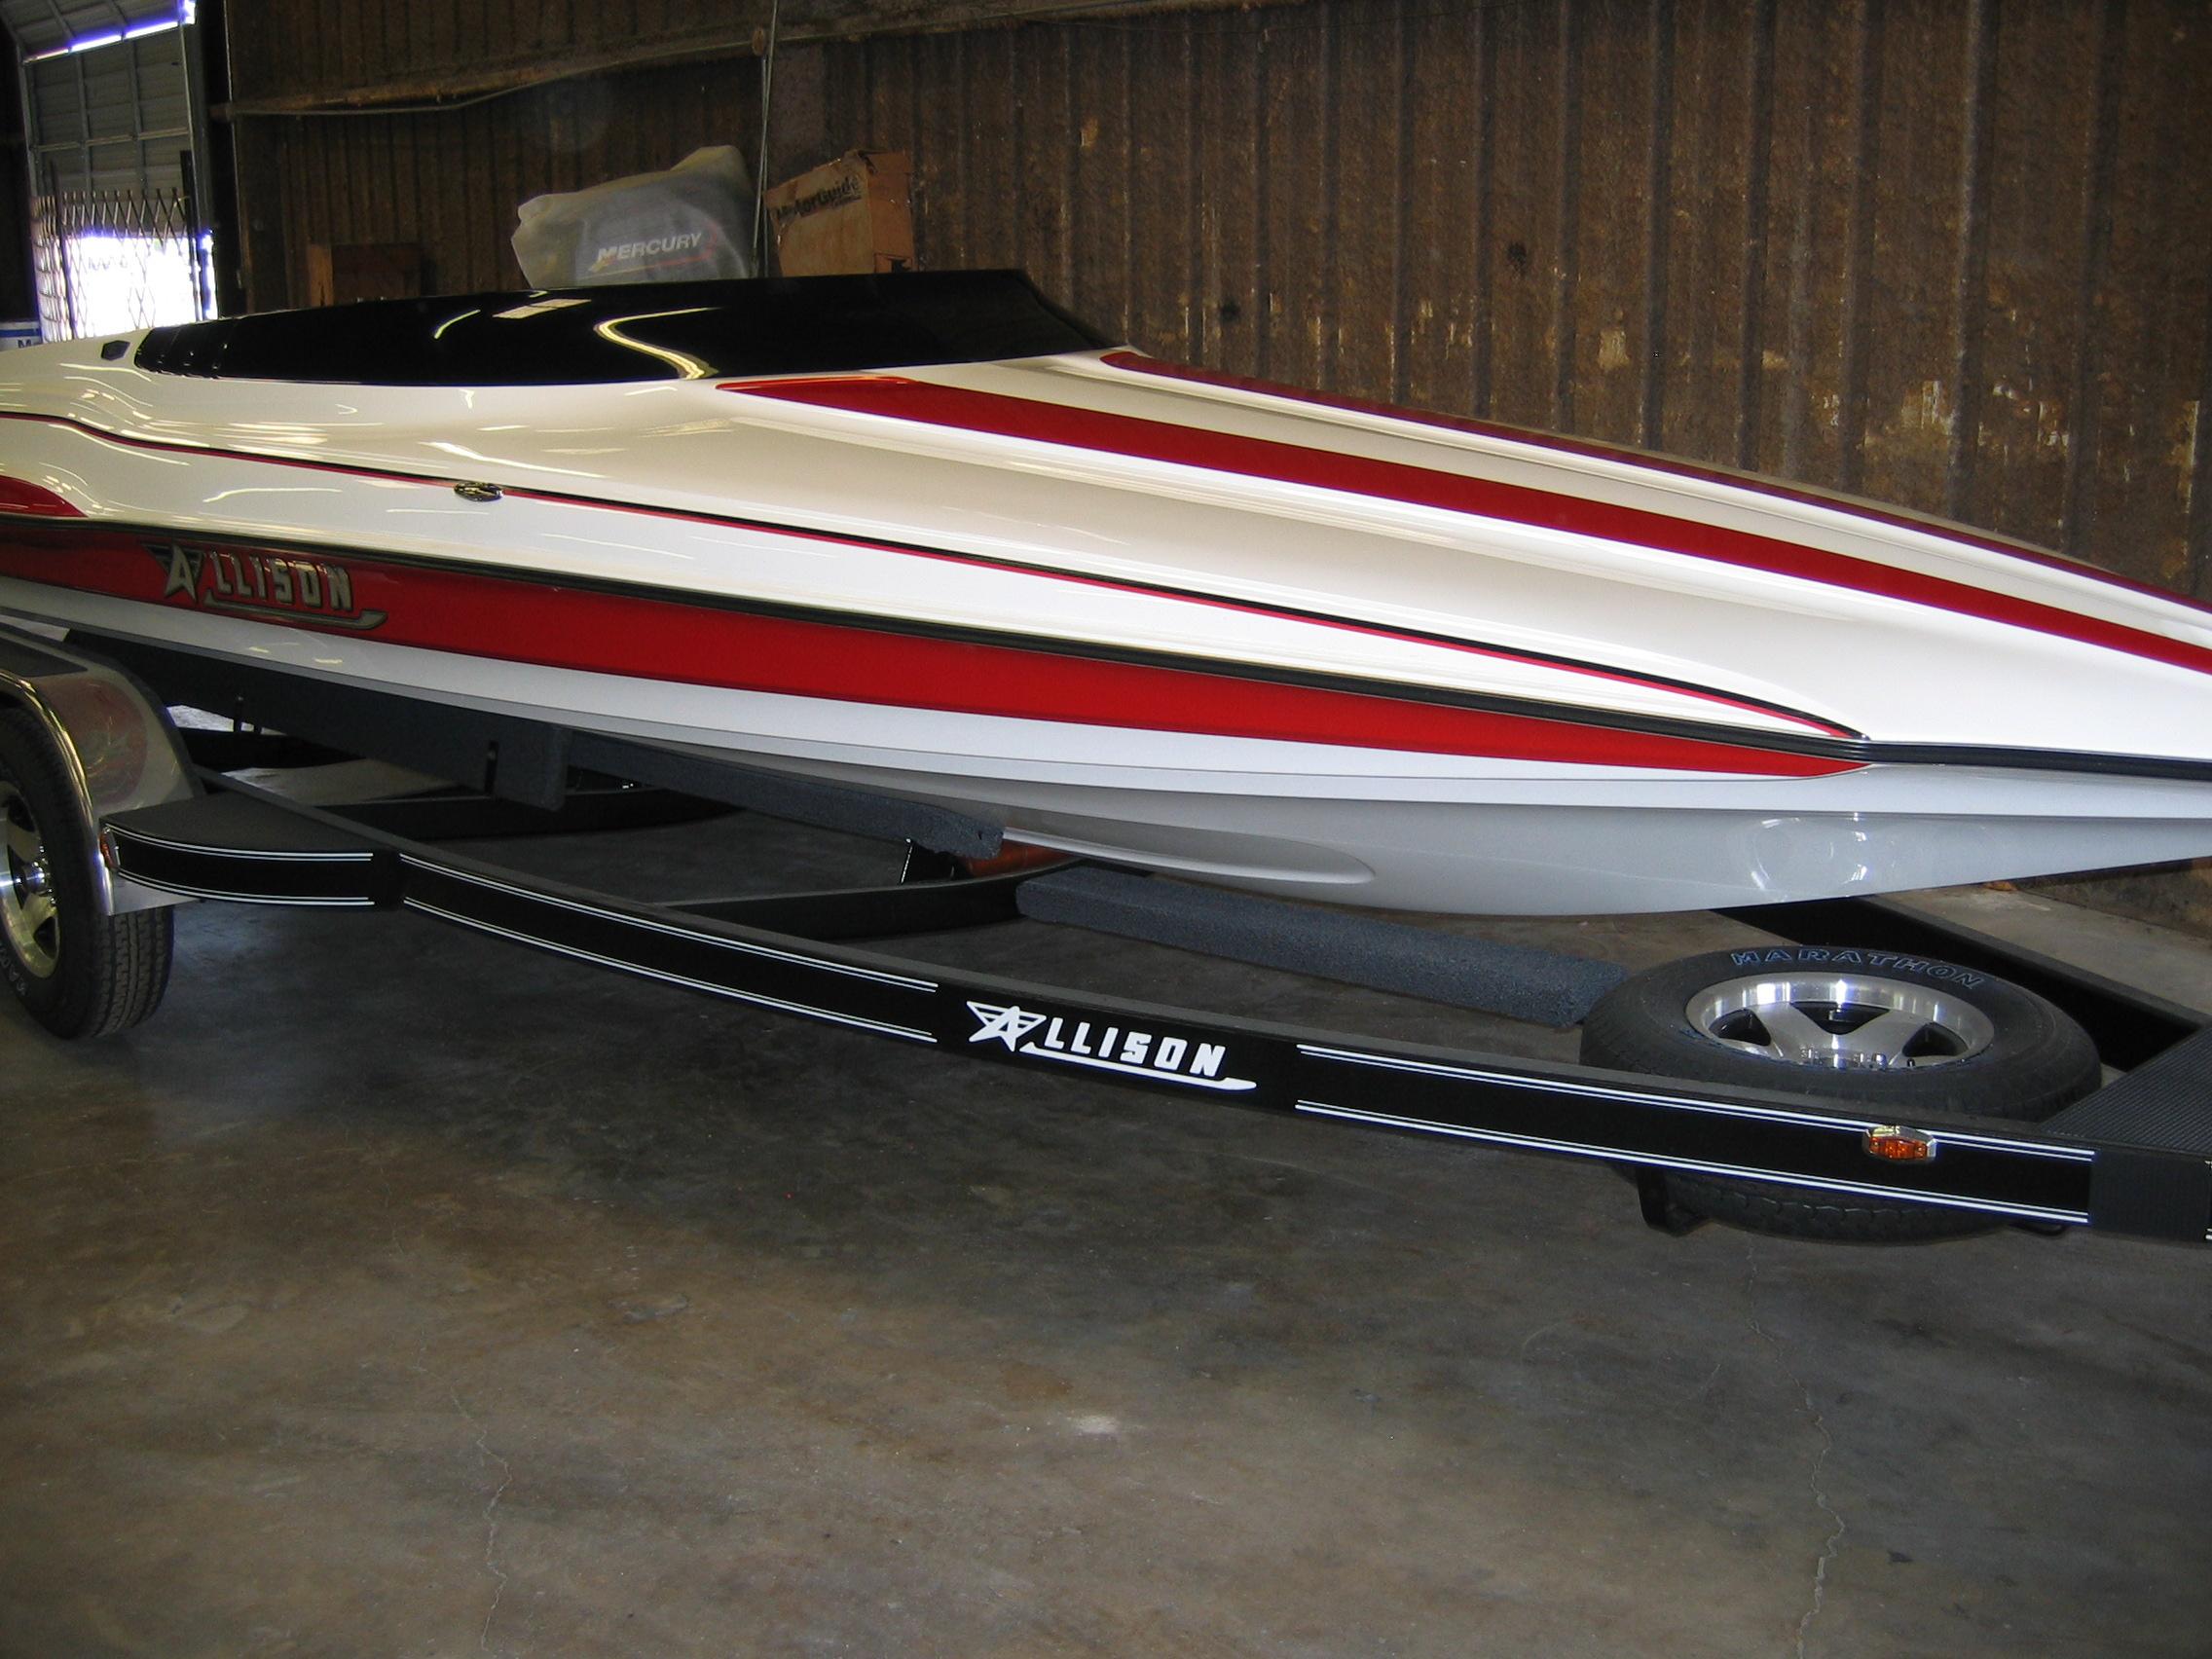 Allison Boats XS2003 GRAND SPORT